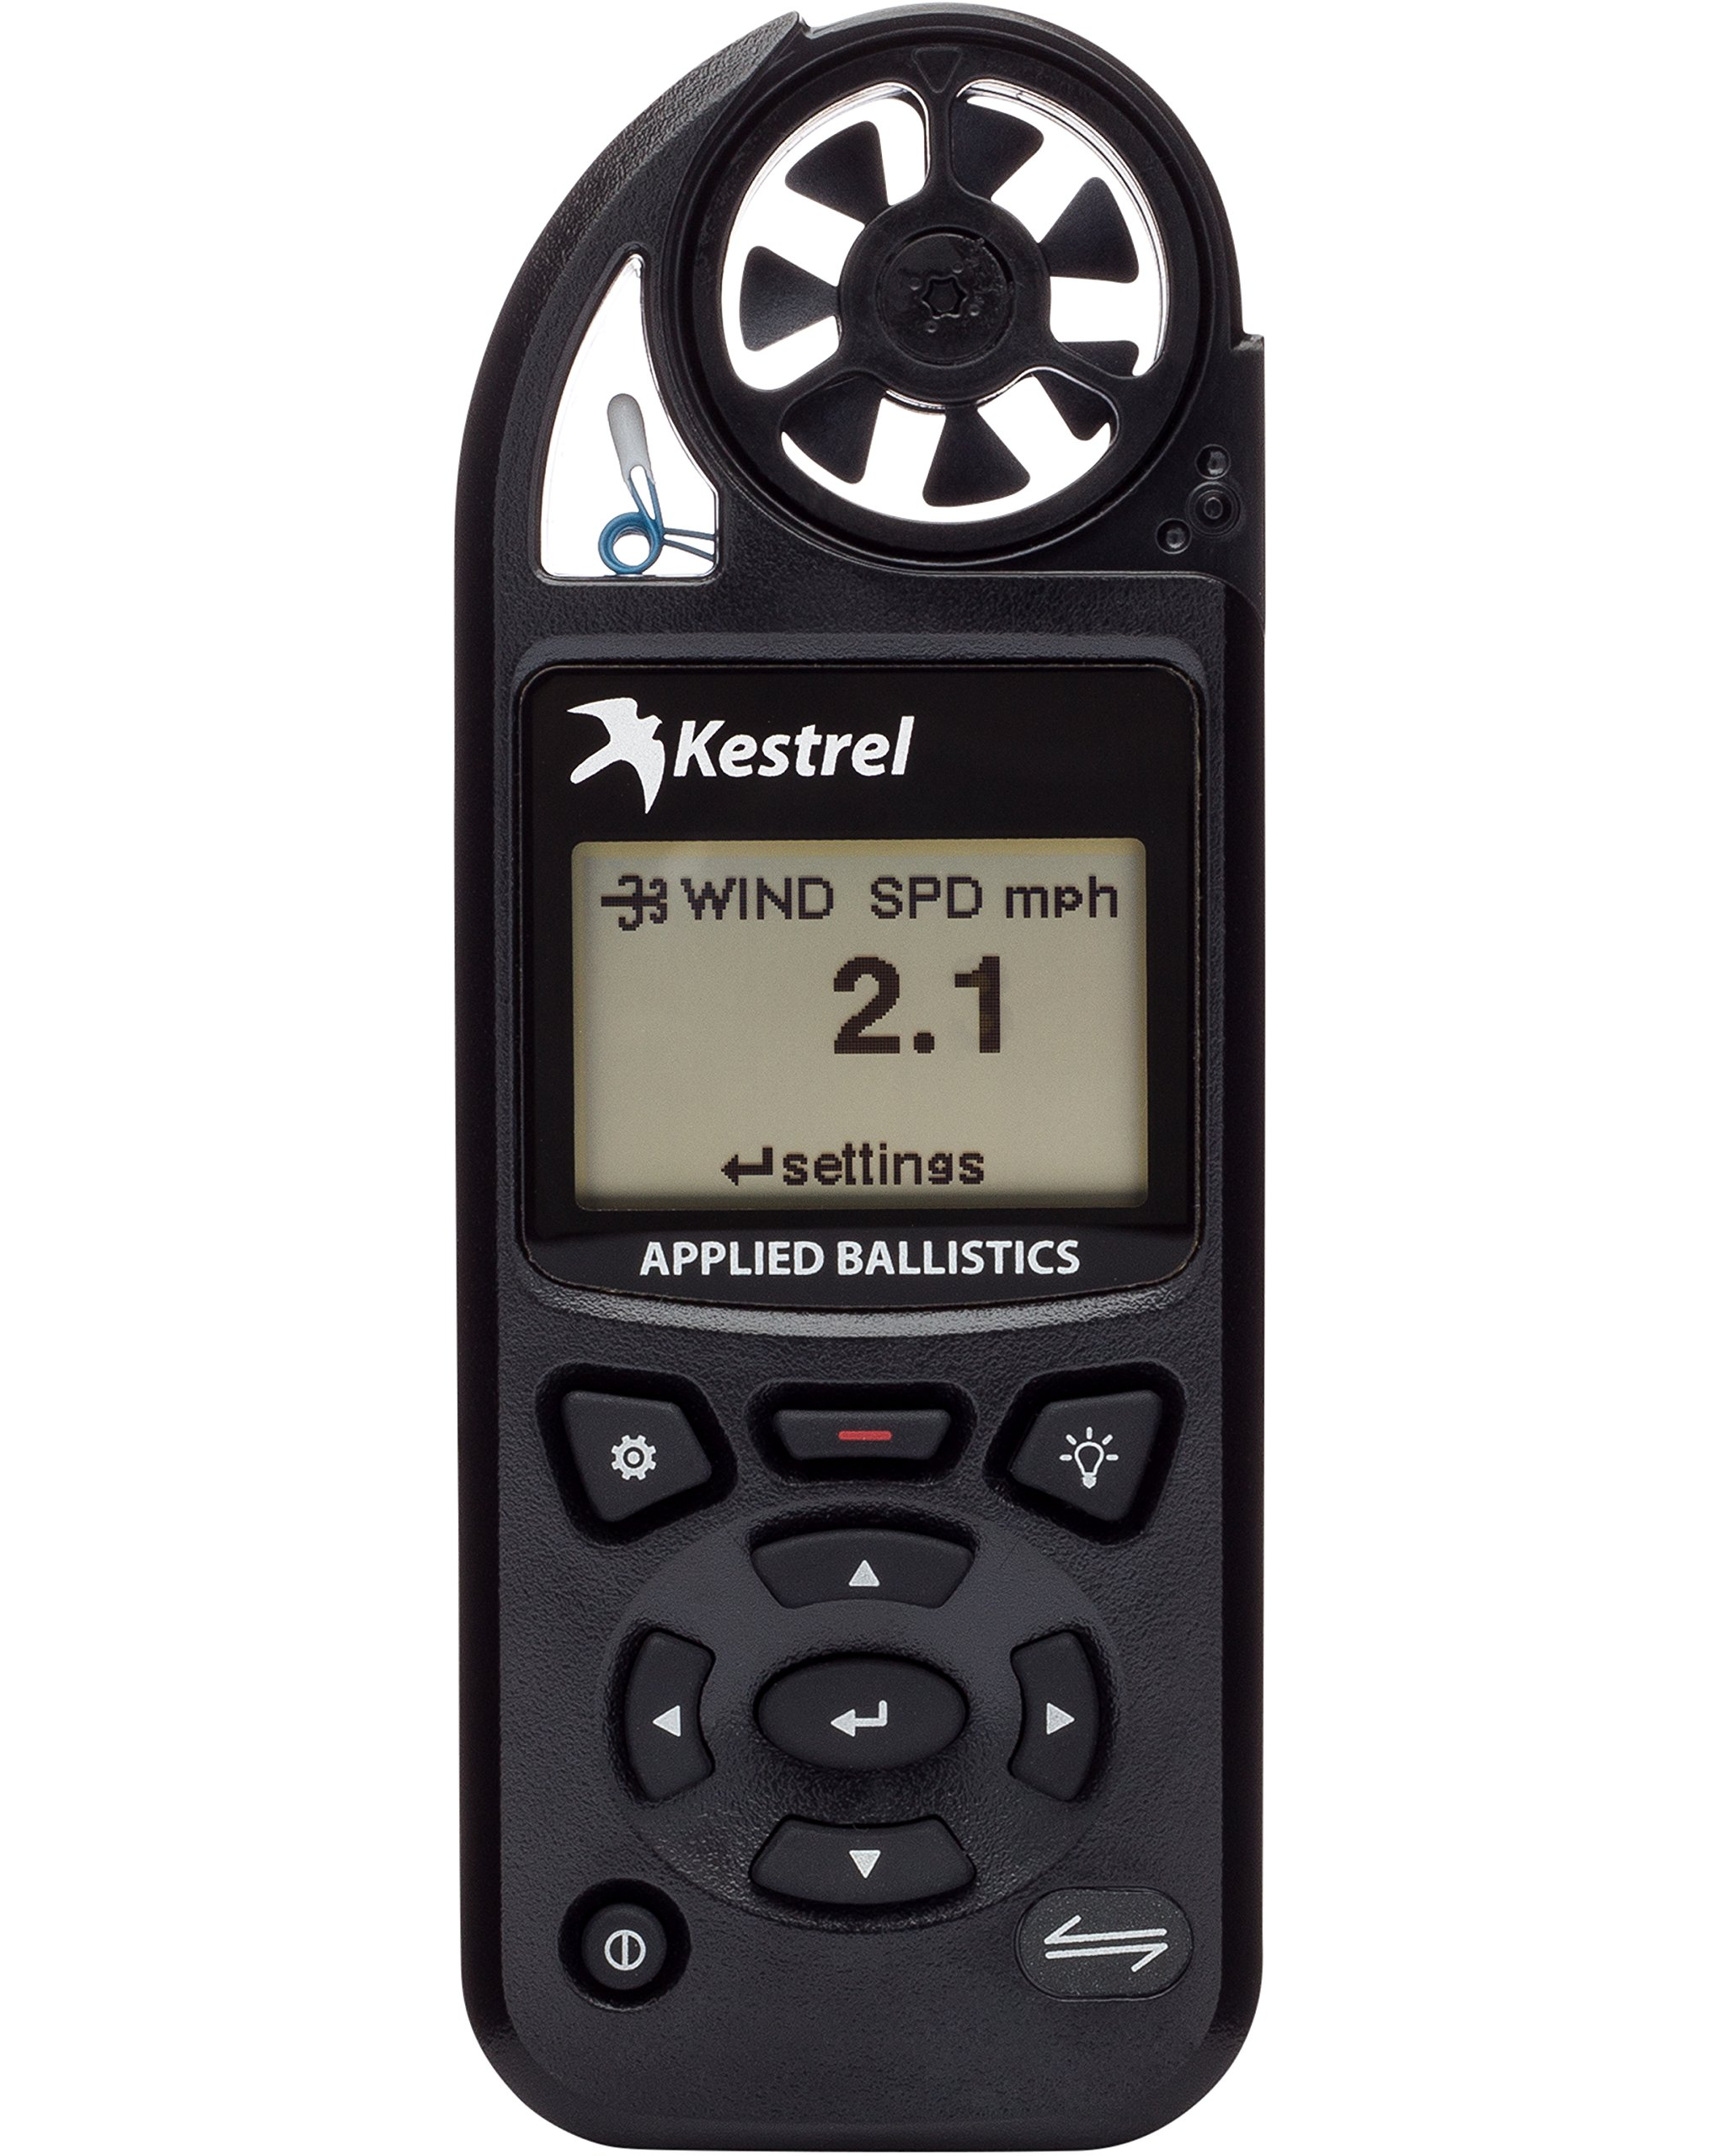 Kestrel 5700 Elite Weather Meter with Applied Ballistics, Black